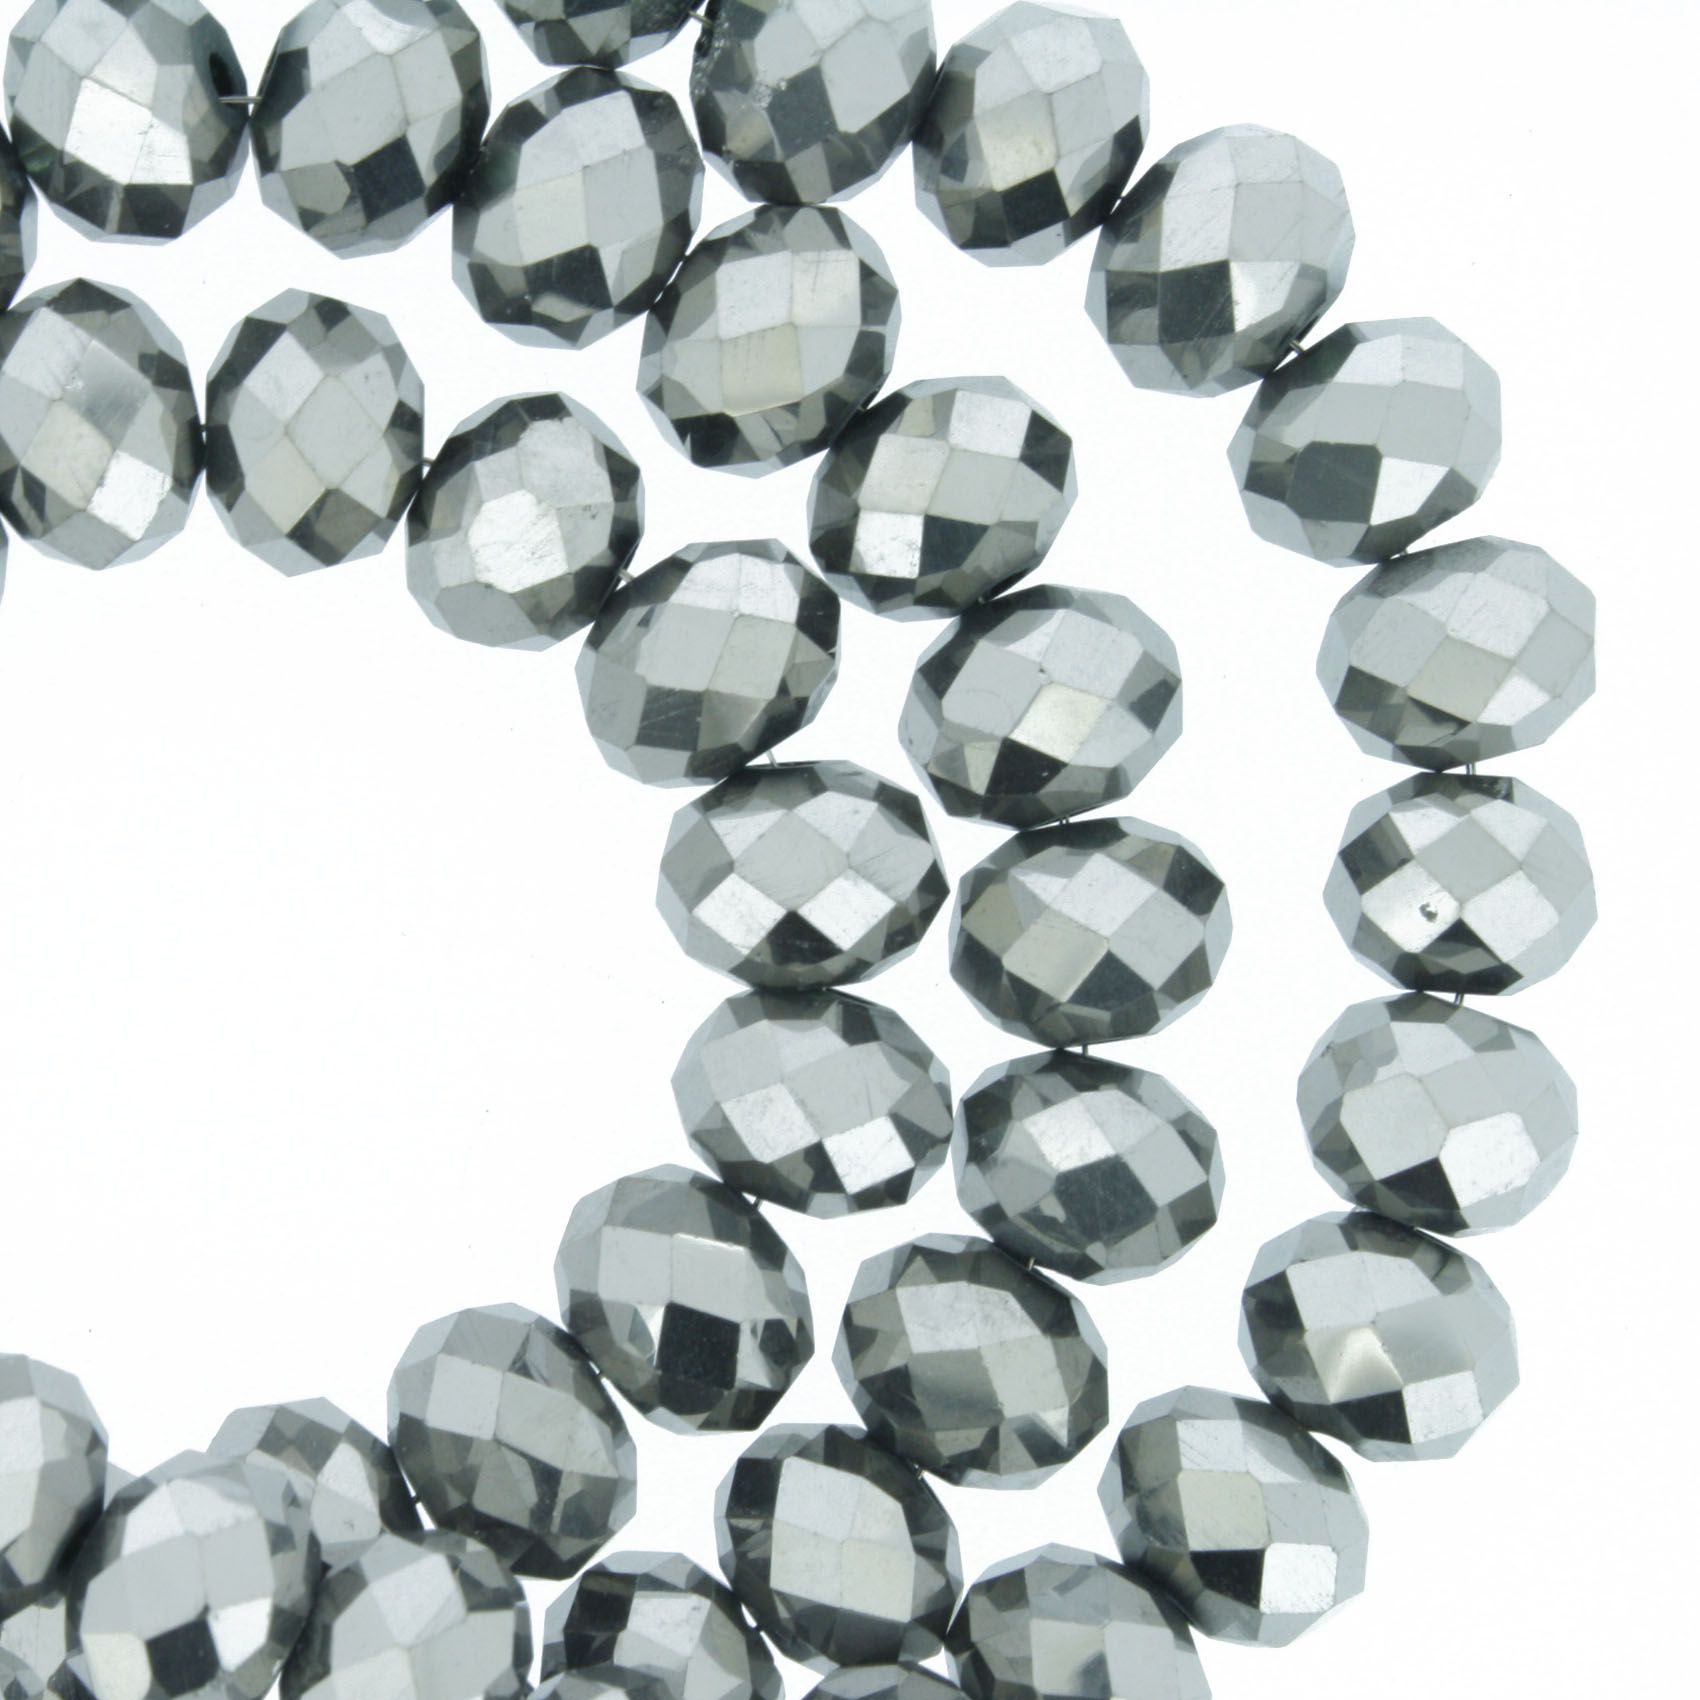 Fio de Cristal - Piatto® - Prata Escuro - 8mm  - Universo Religioso® - Artigos de Umbanda e Candomblé